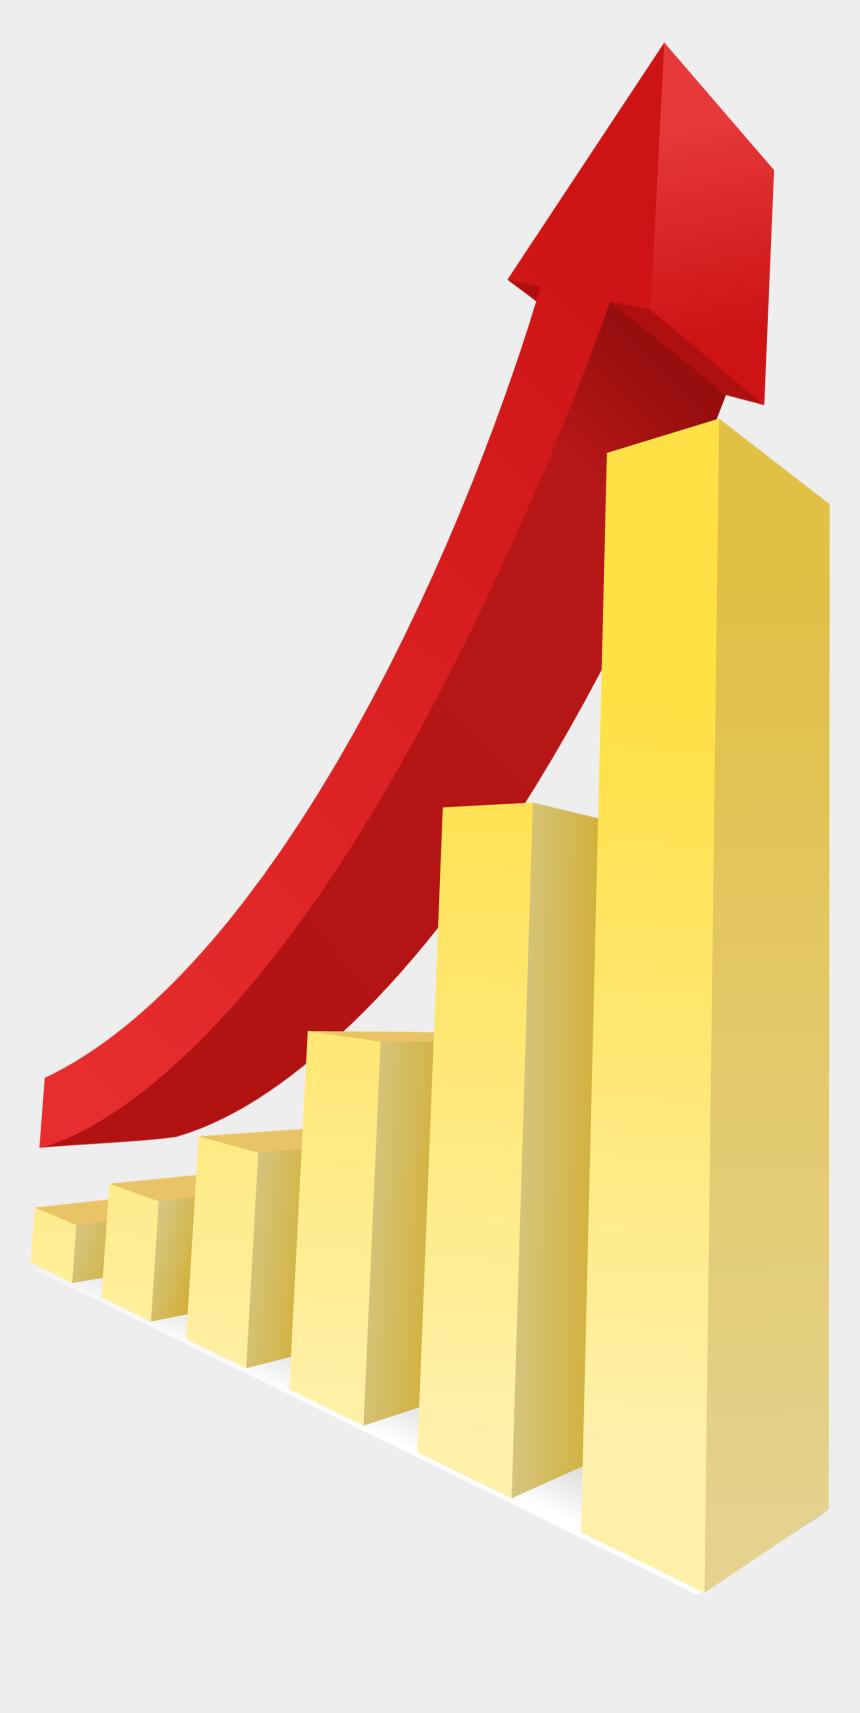 stock clipart, Cartoons - Graph Clipart Stock Market Graph - Stock Market Going Up Transparent